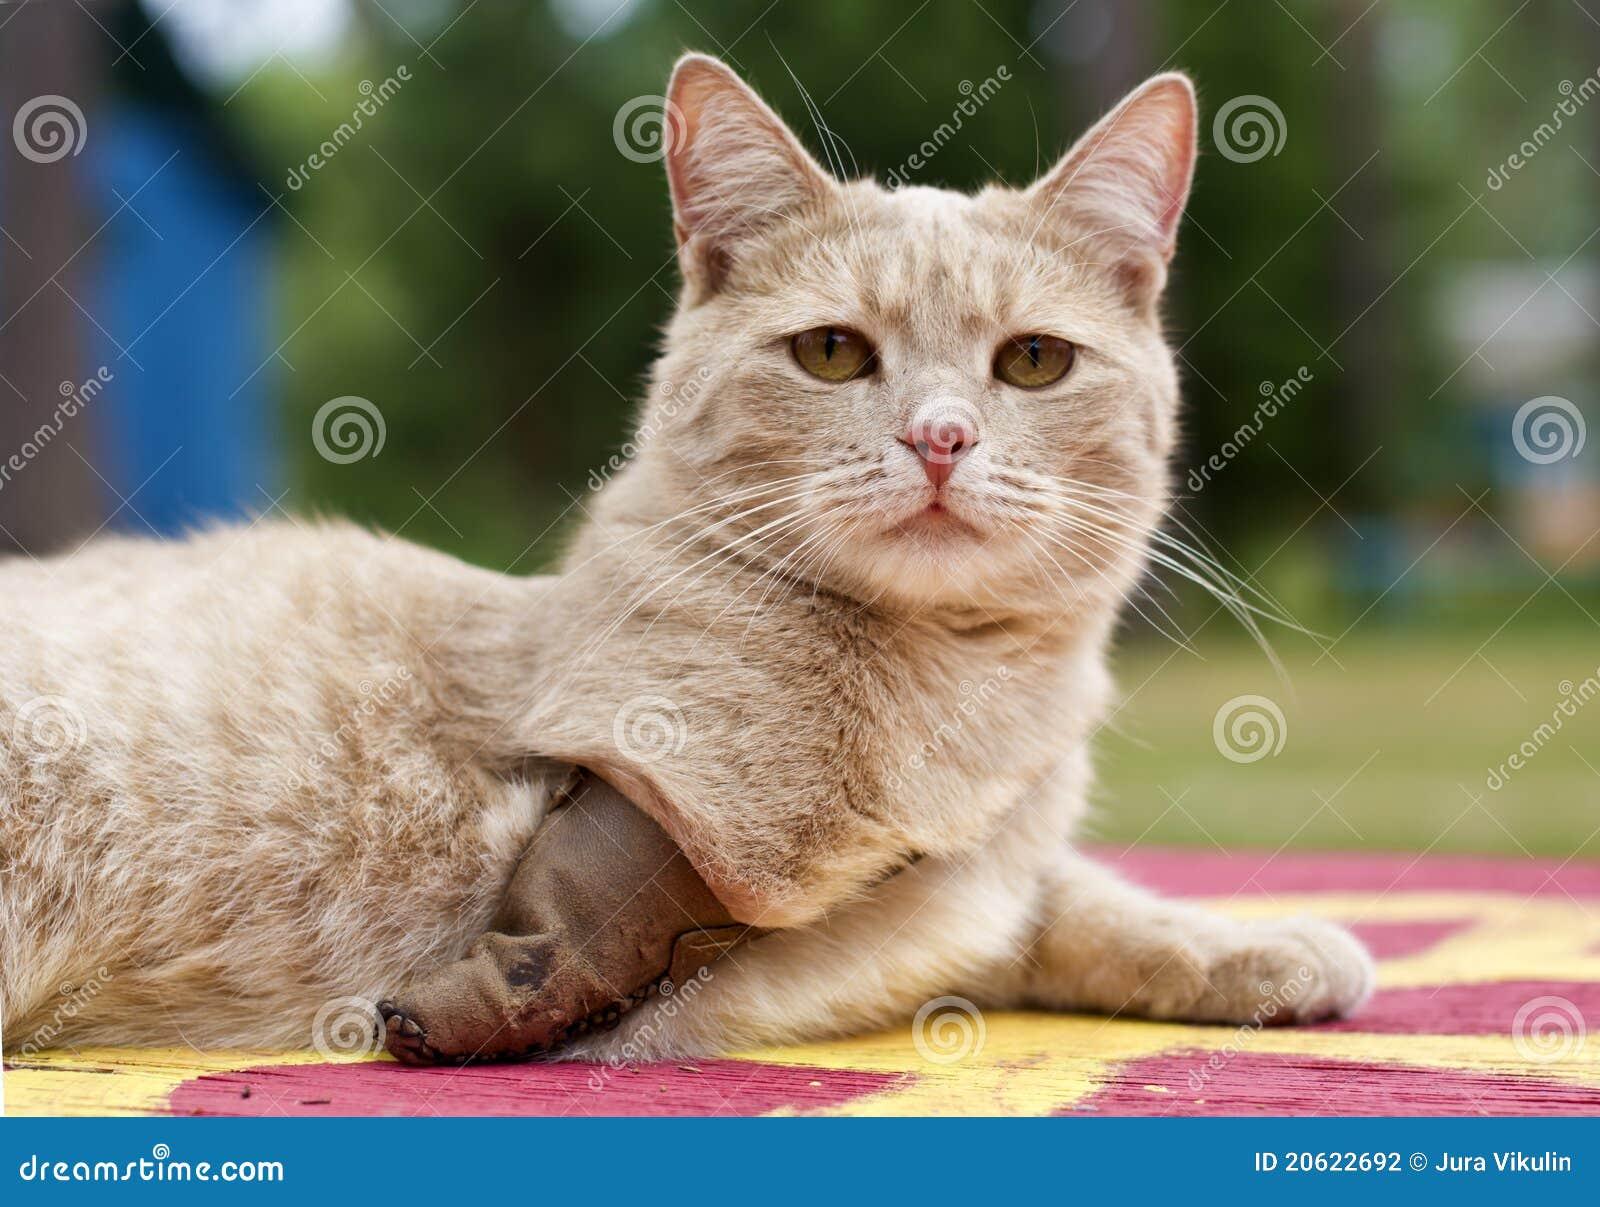 Cat the invalid